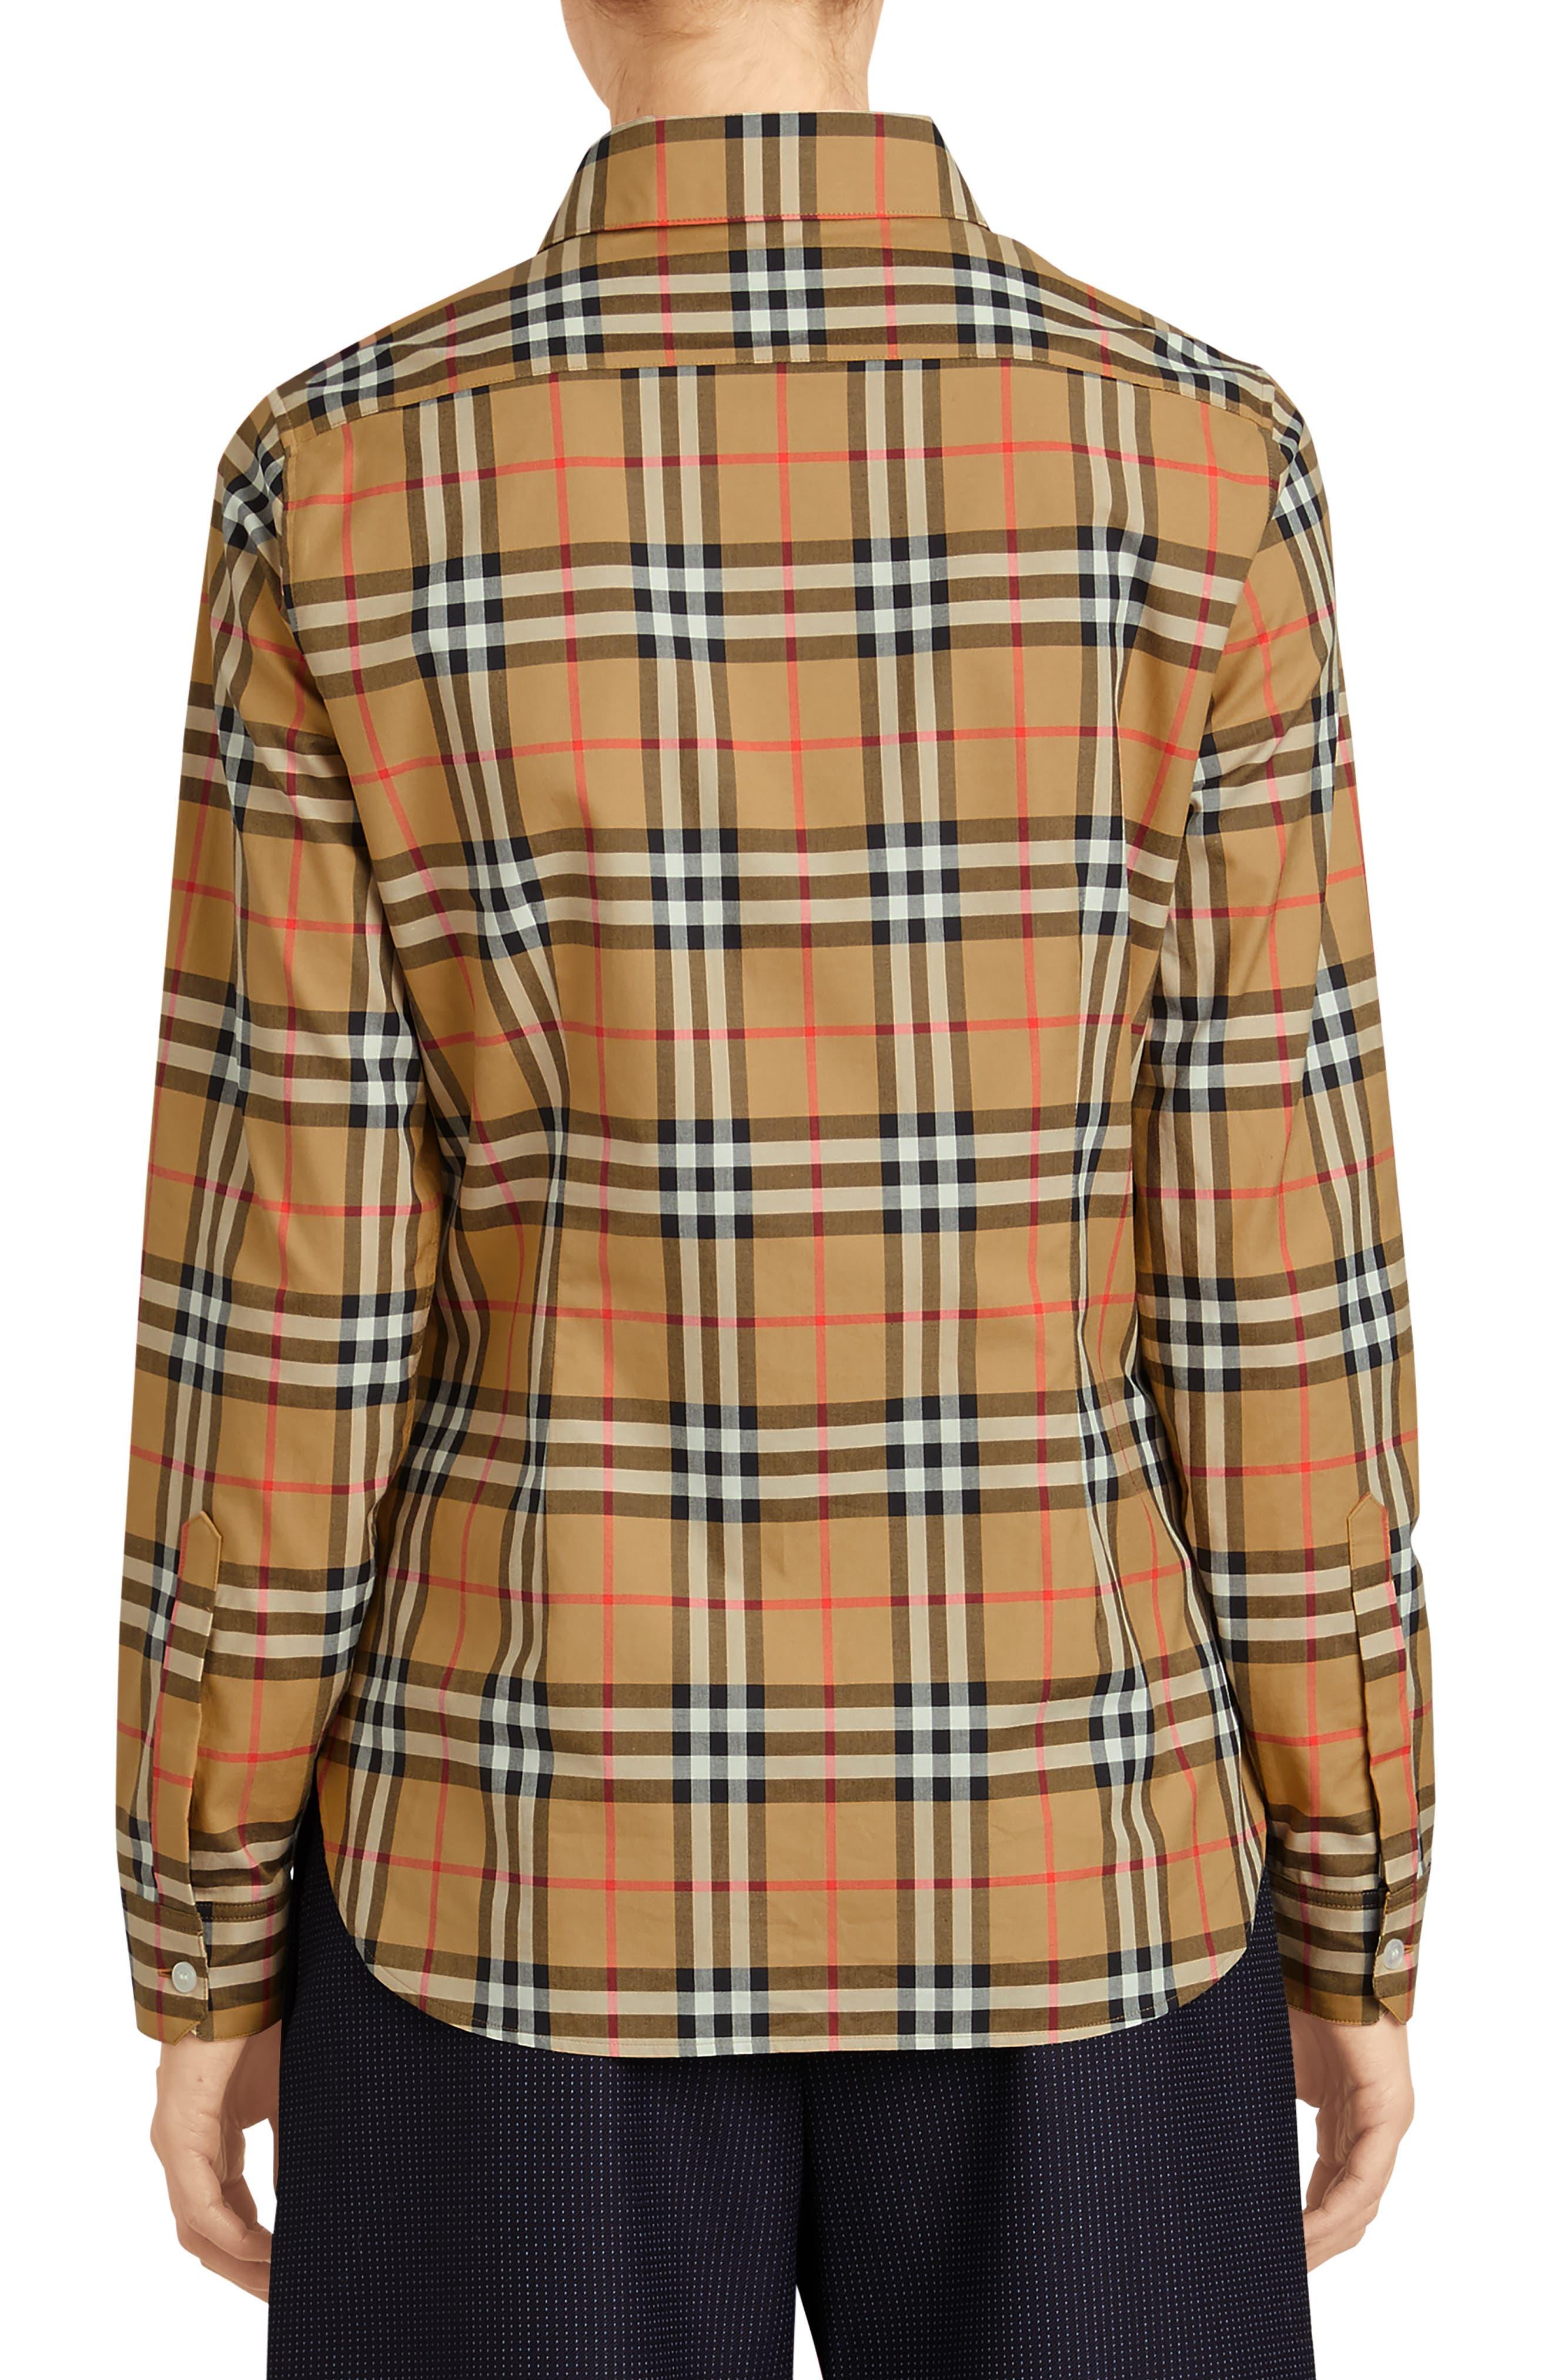 Crow Vintage Check Shirt,                             Alternate thumbnail 2, color,                             ANTIQUE YELLOW CHECK